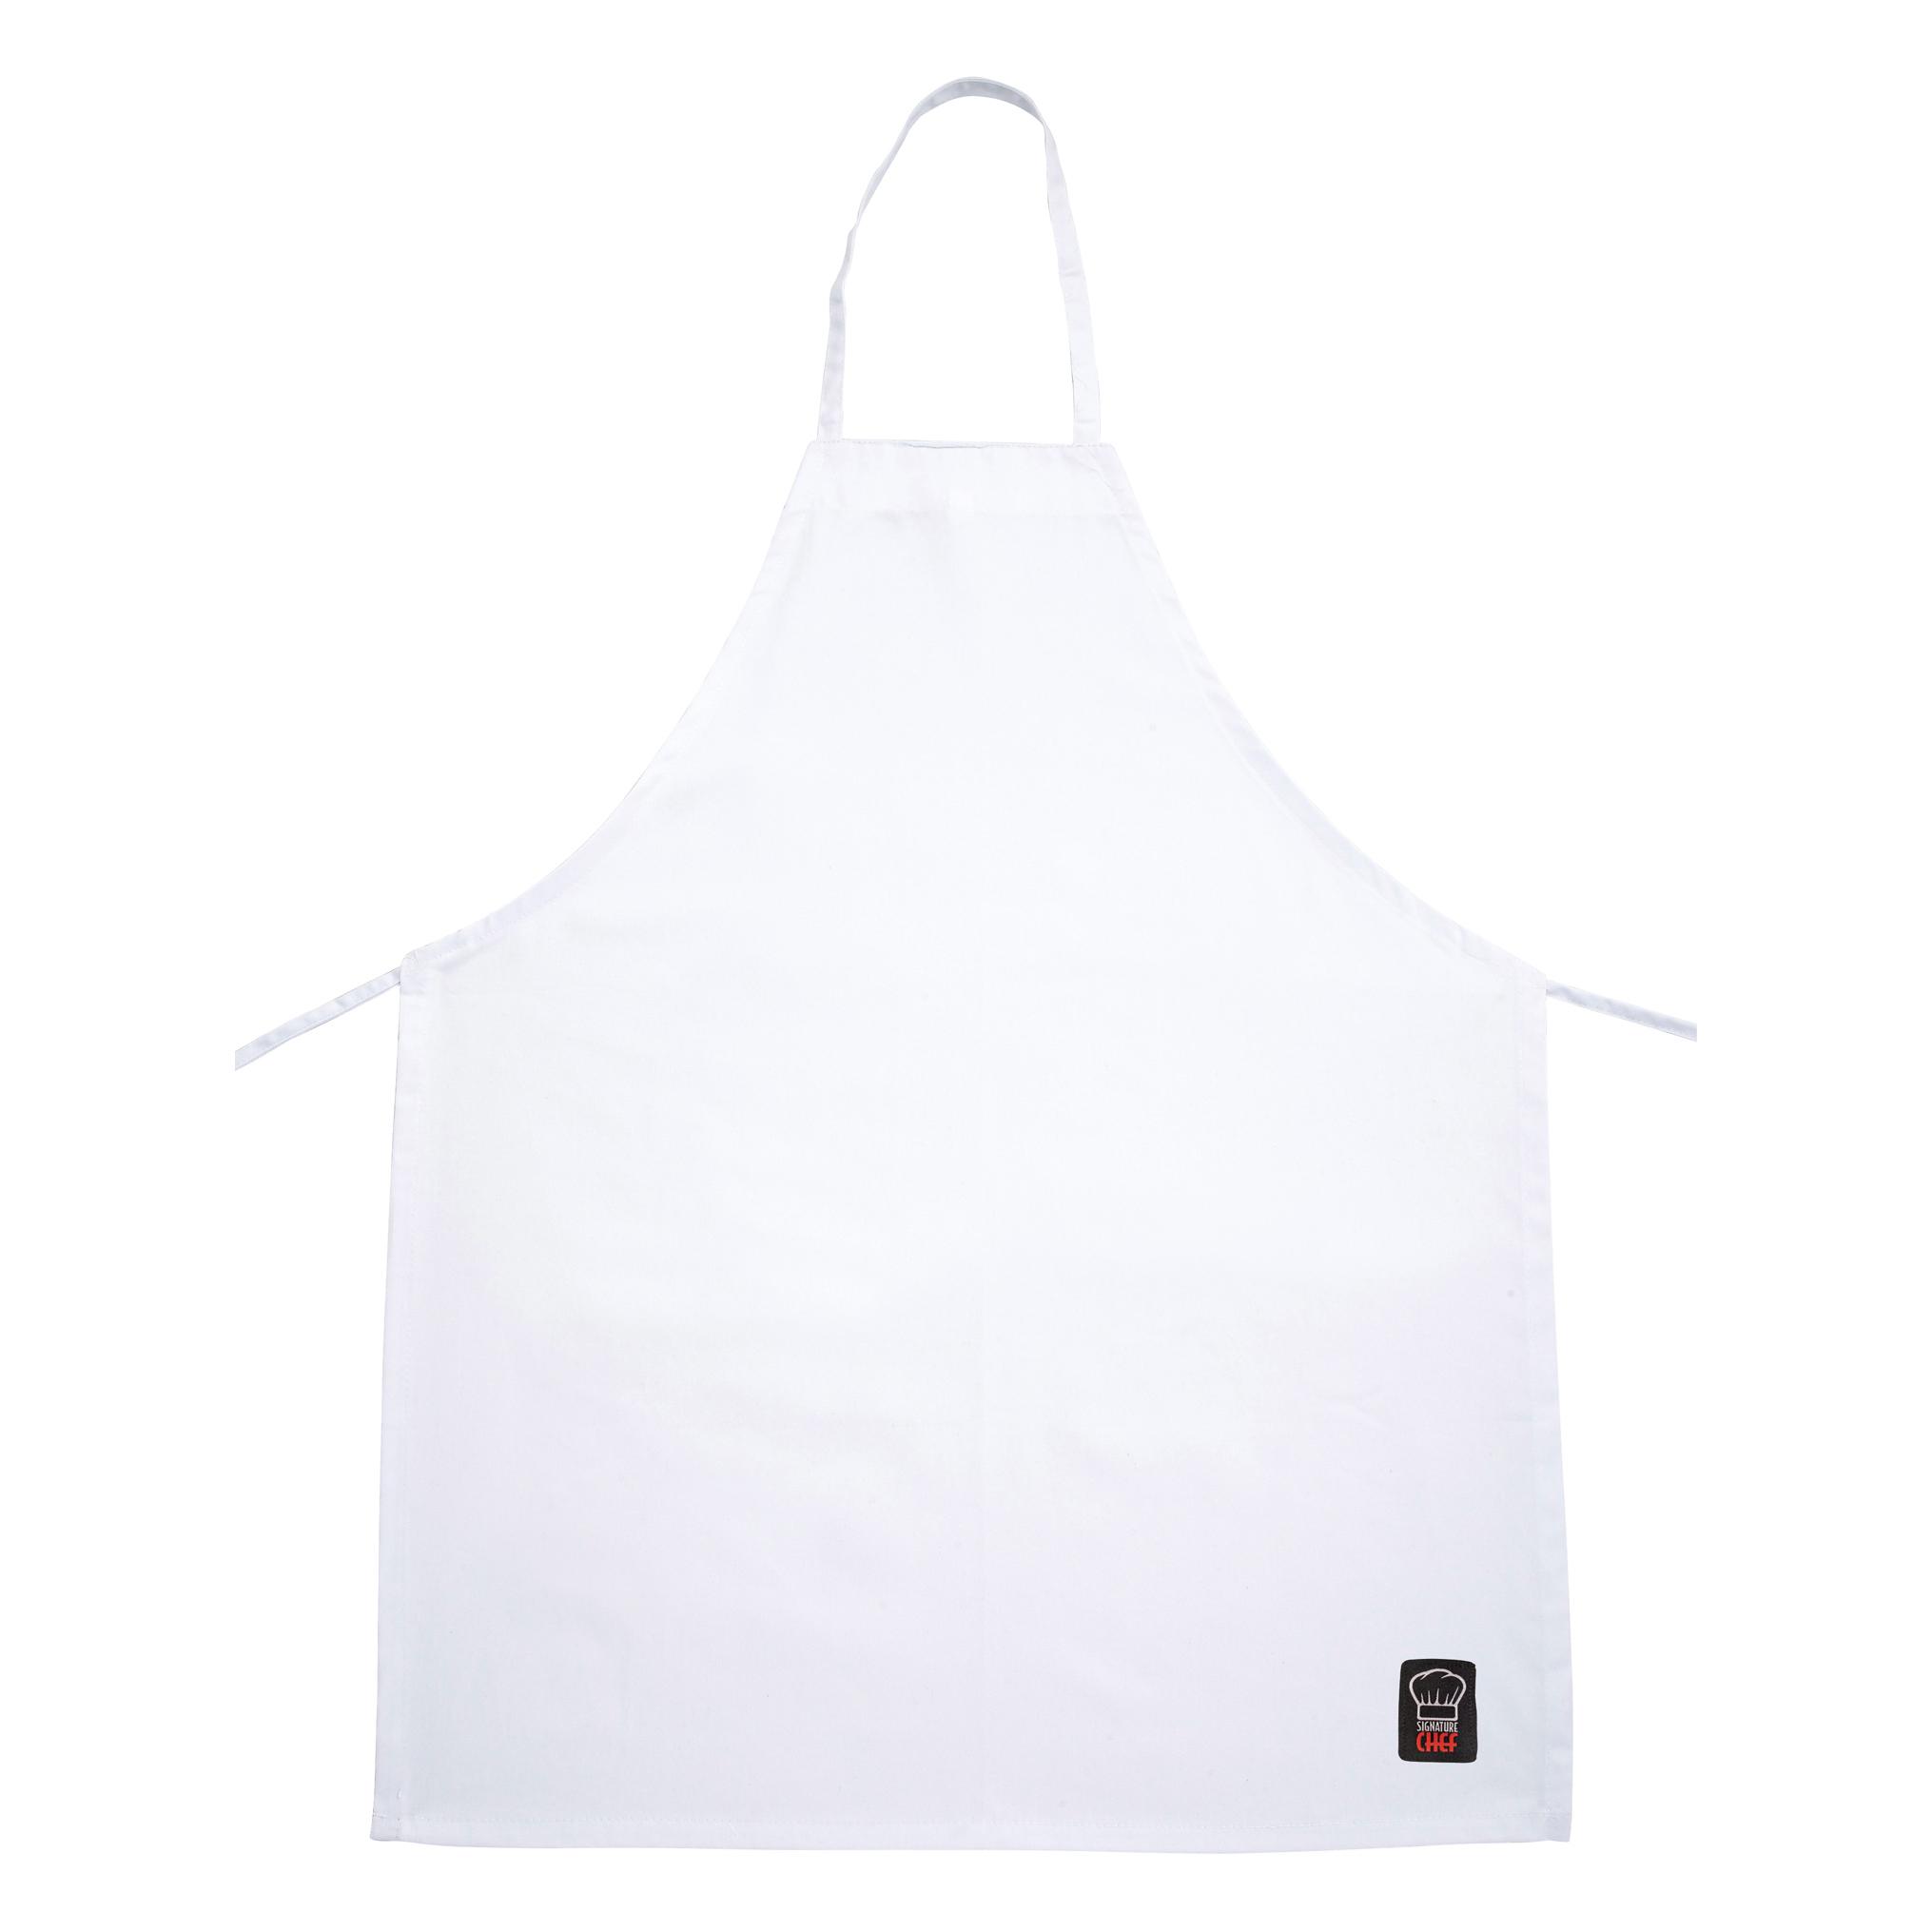 1550-70 Winco BA-3226WH bib apron